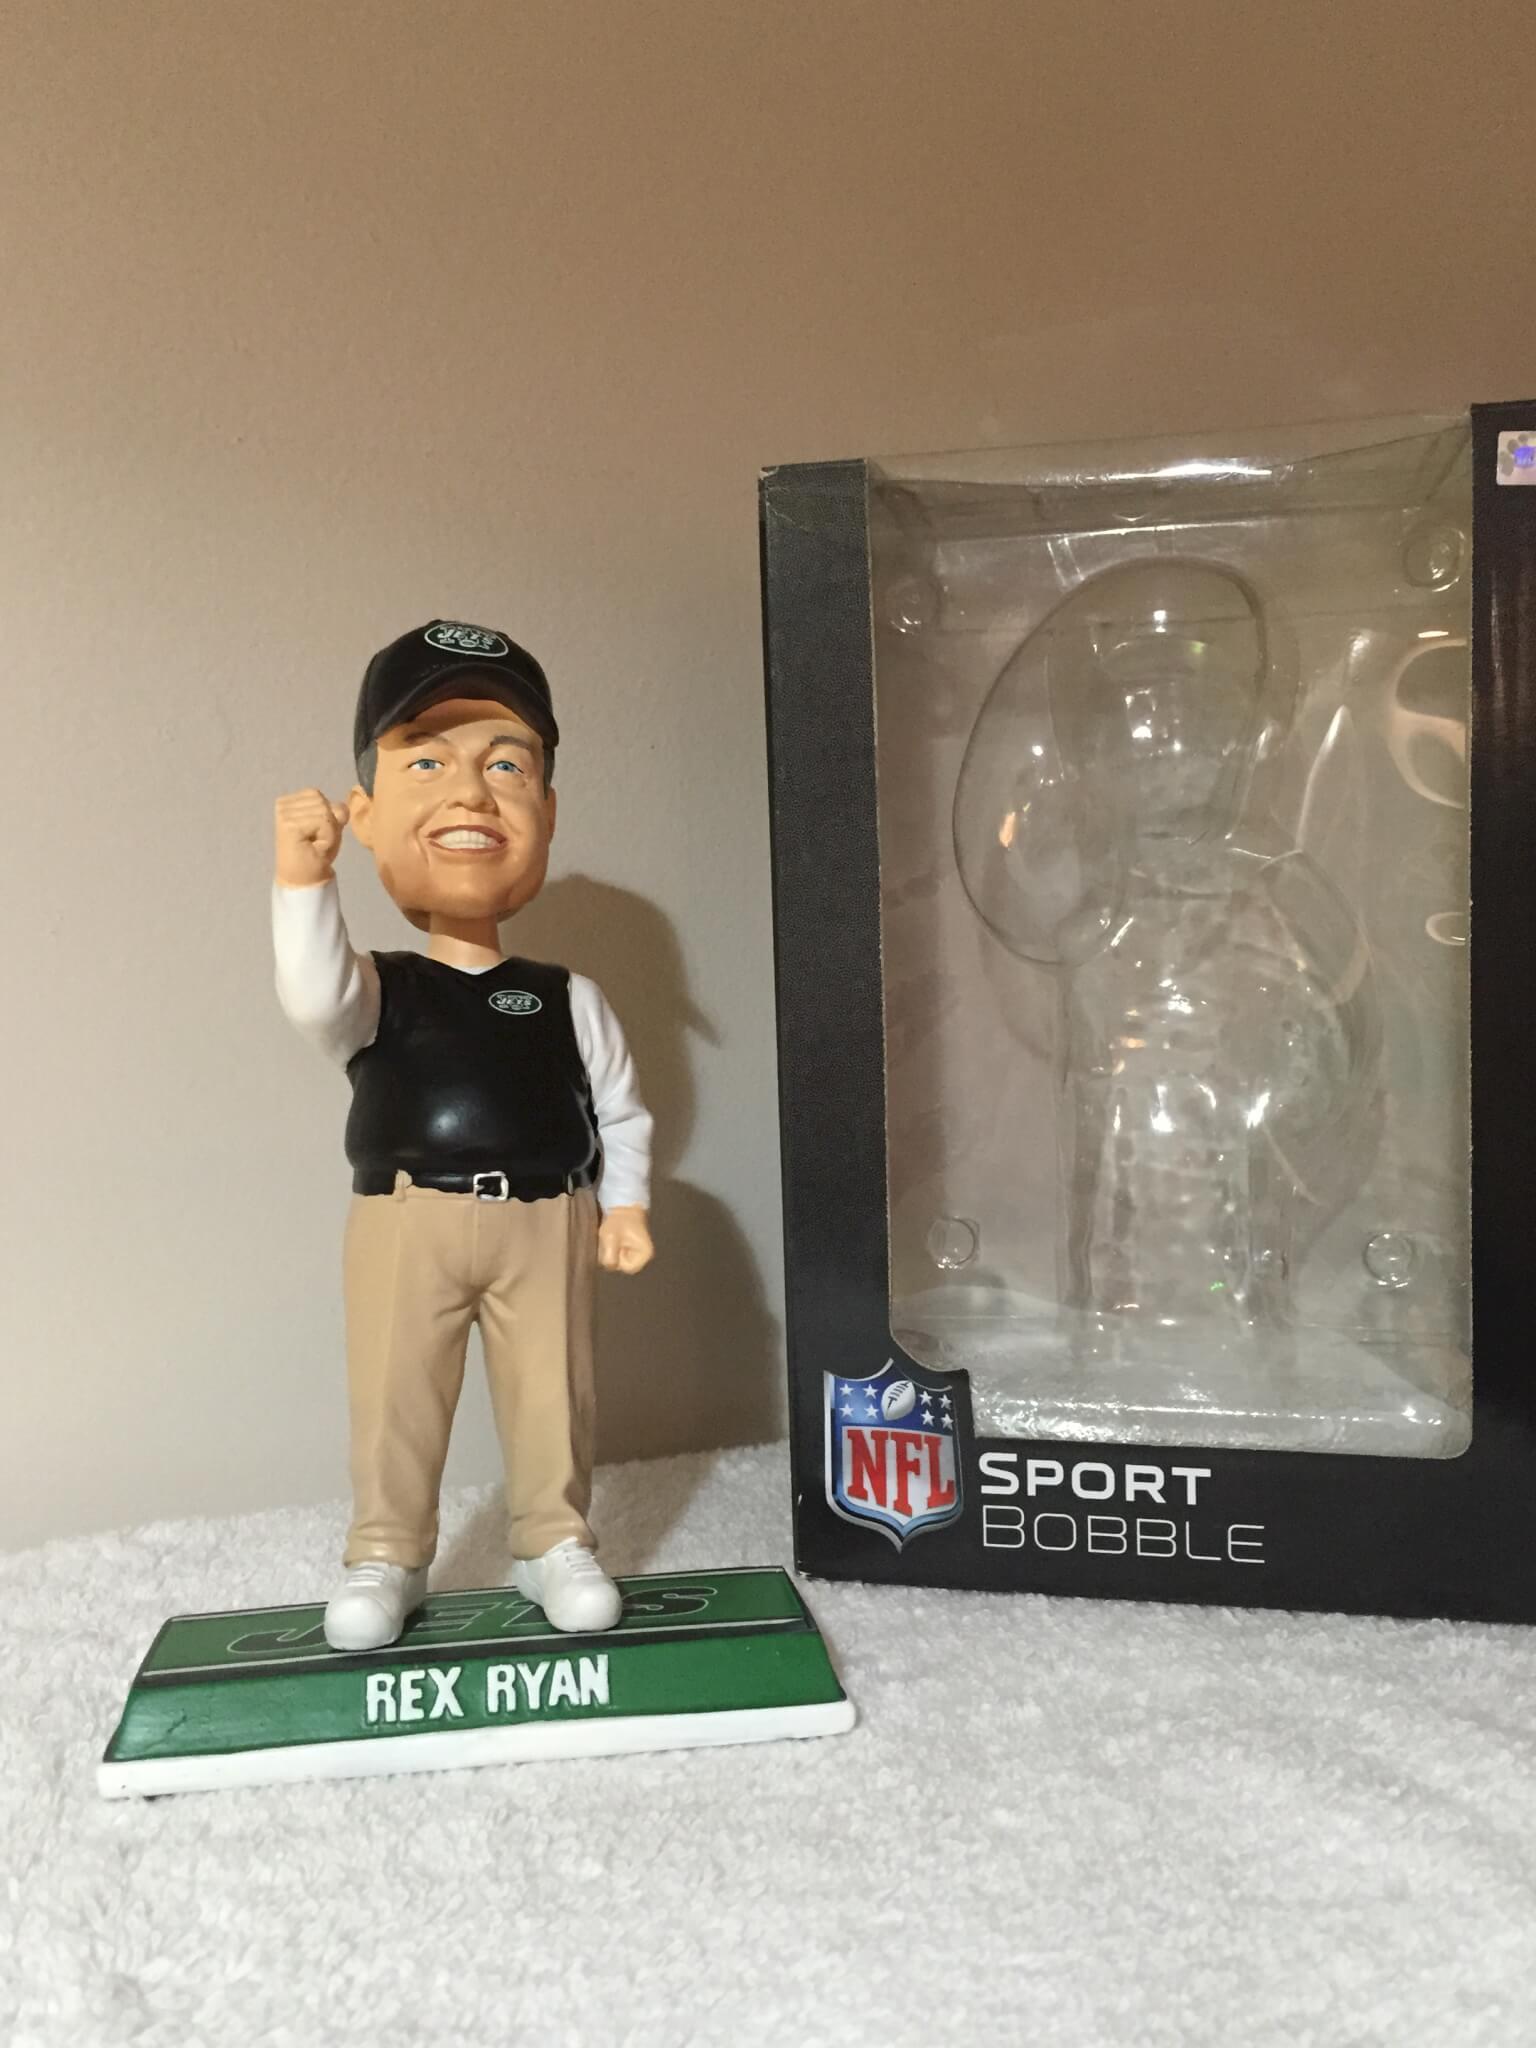 Rex Ryan